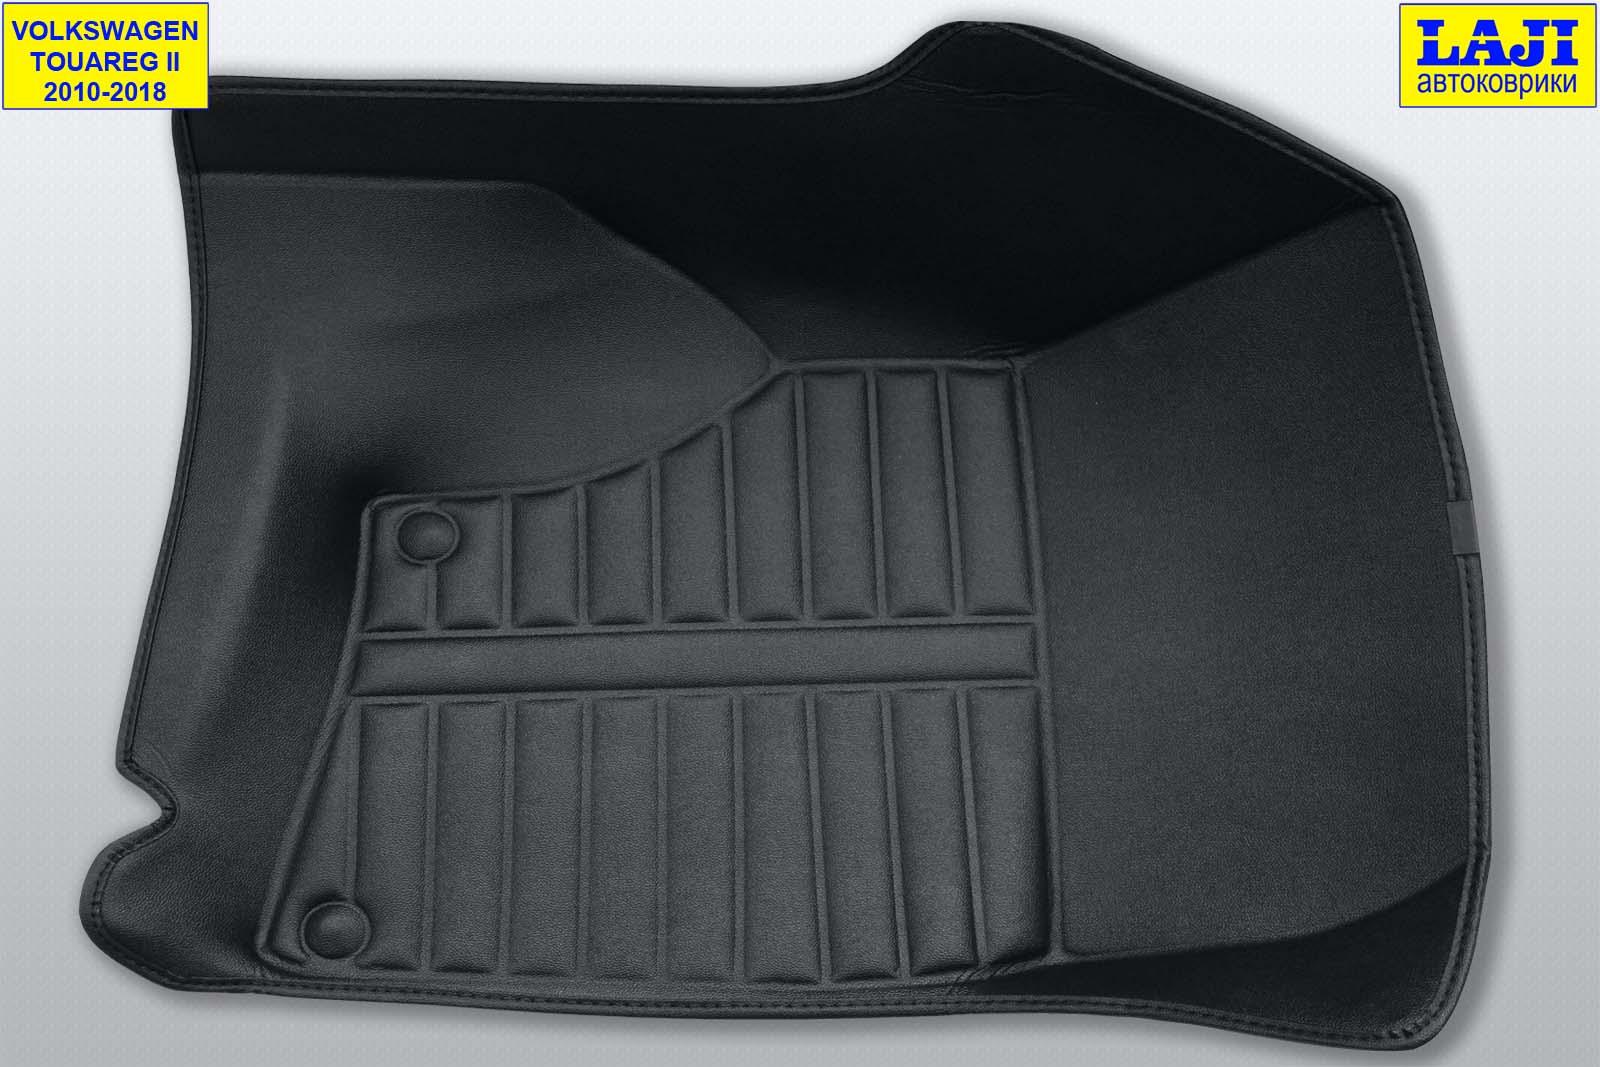 5D коврики в салон Volkswagen Touareg 2 2010-2018 4